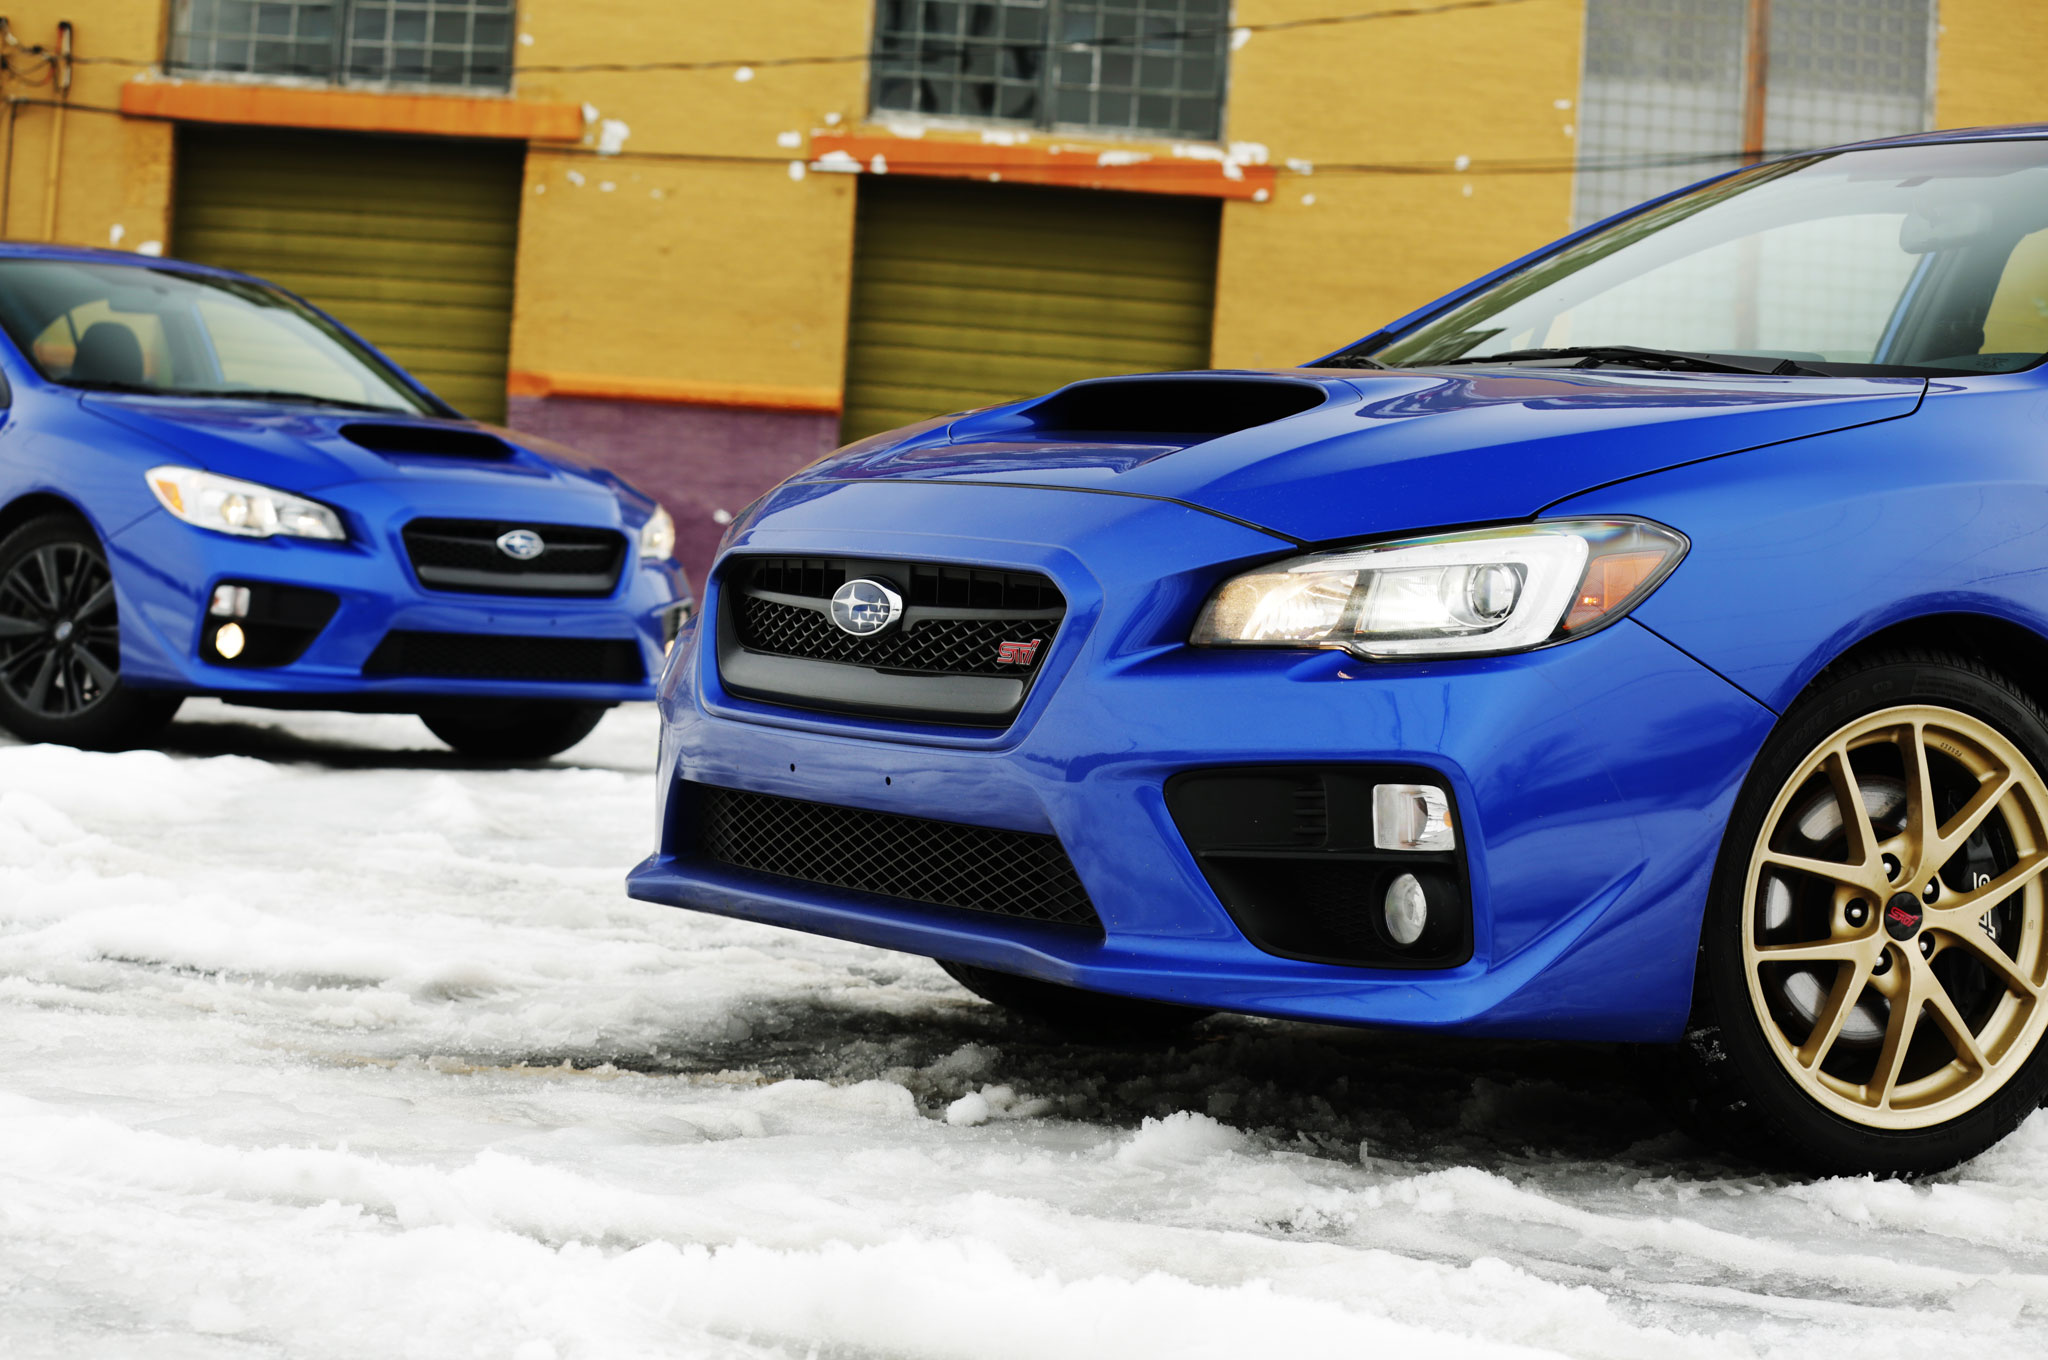 2015 Subaru WRX Premium - Is the STI the Better Rex?